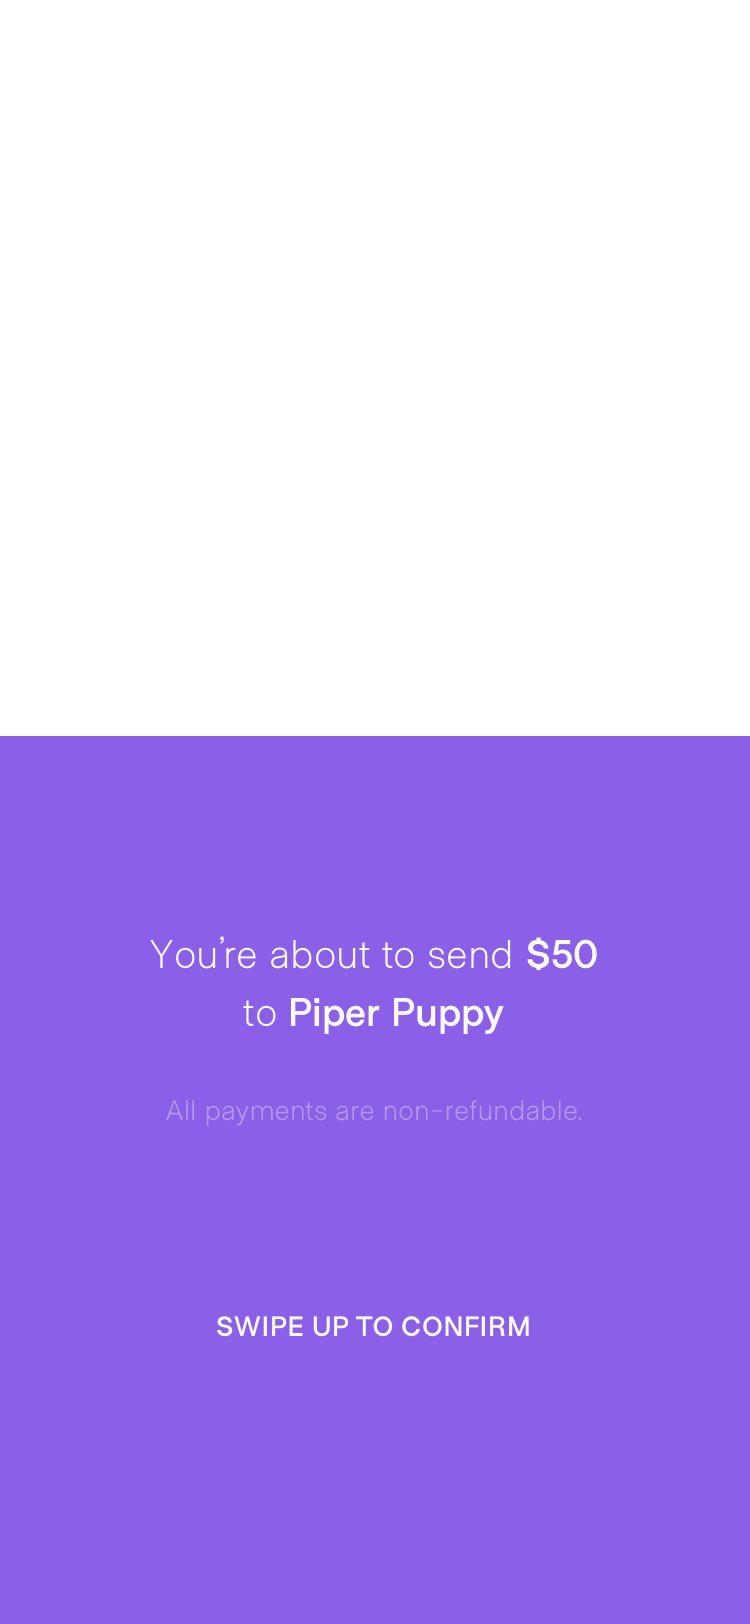 Tipping Screen Copy.jpg